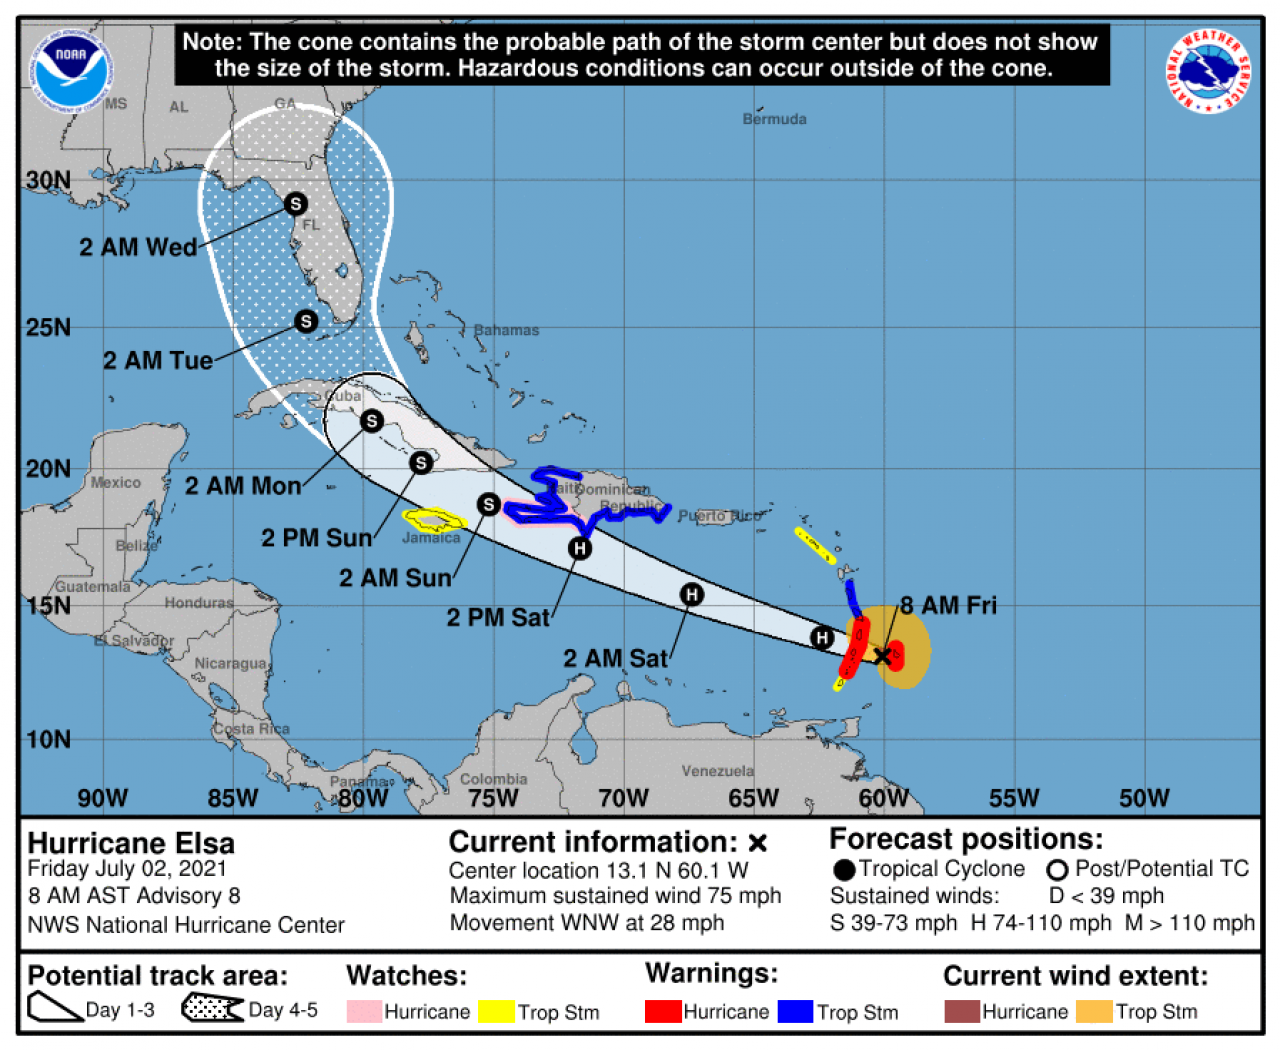 La rotta prevista dell'uragano Elsa (Fonte: National Hurricane Center)